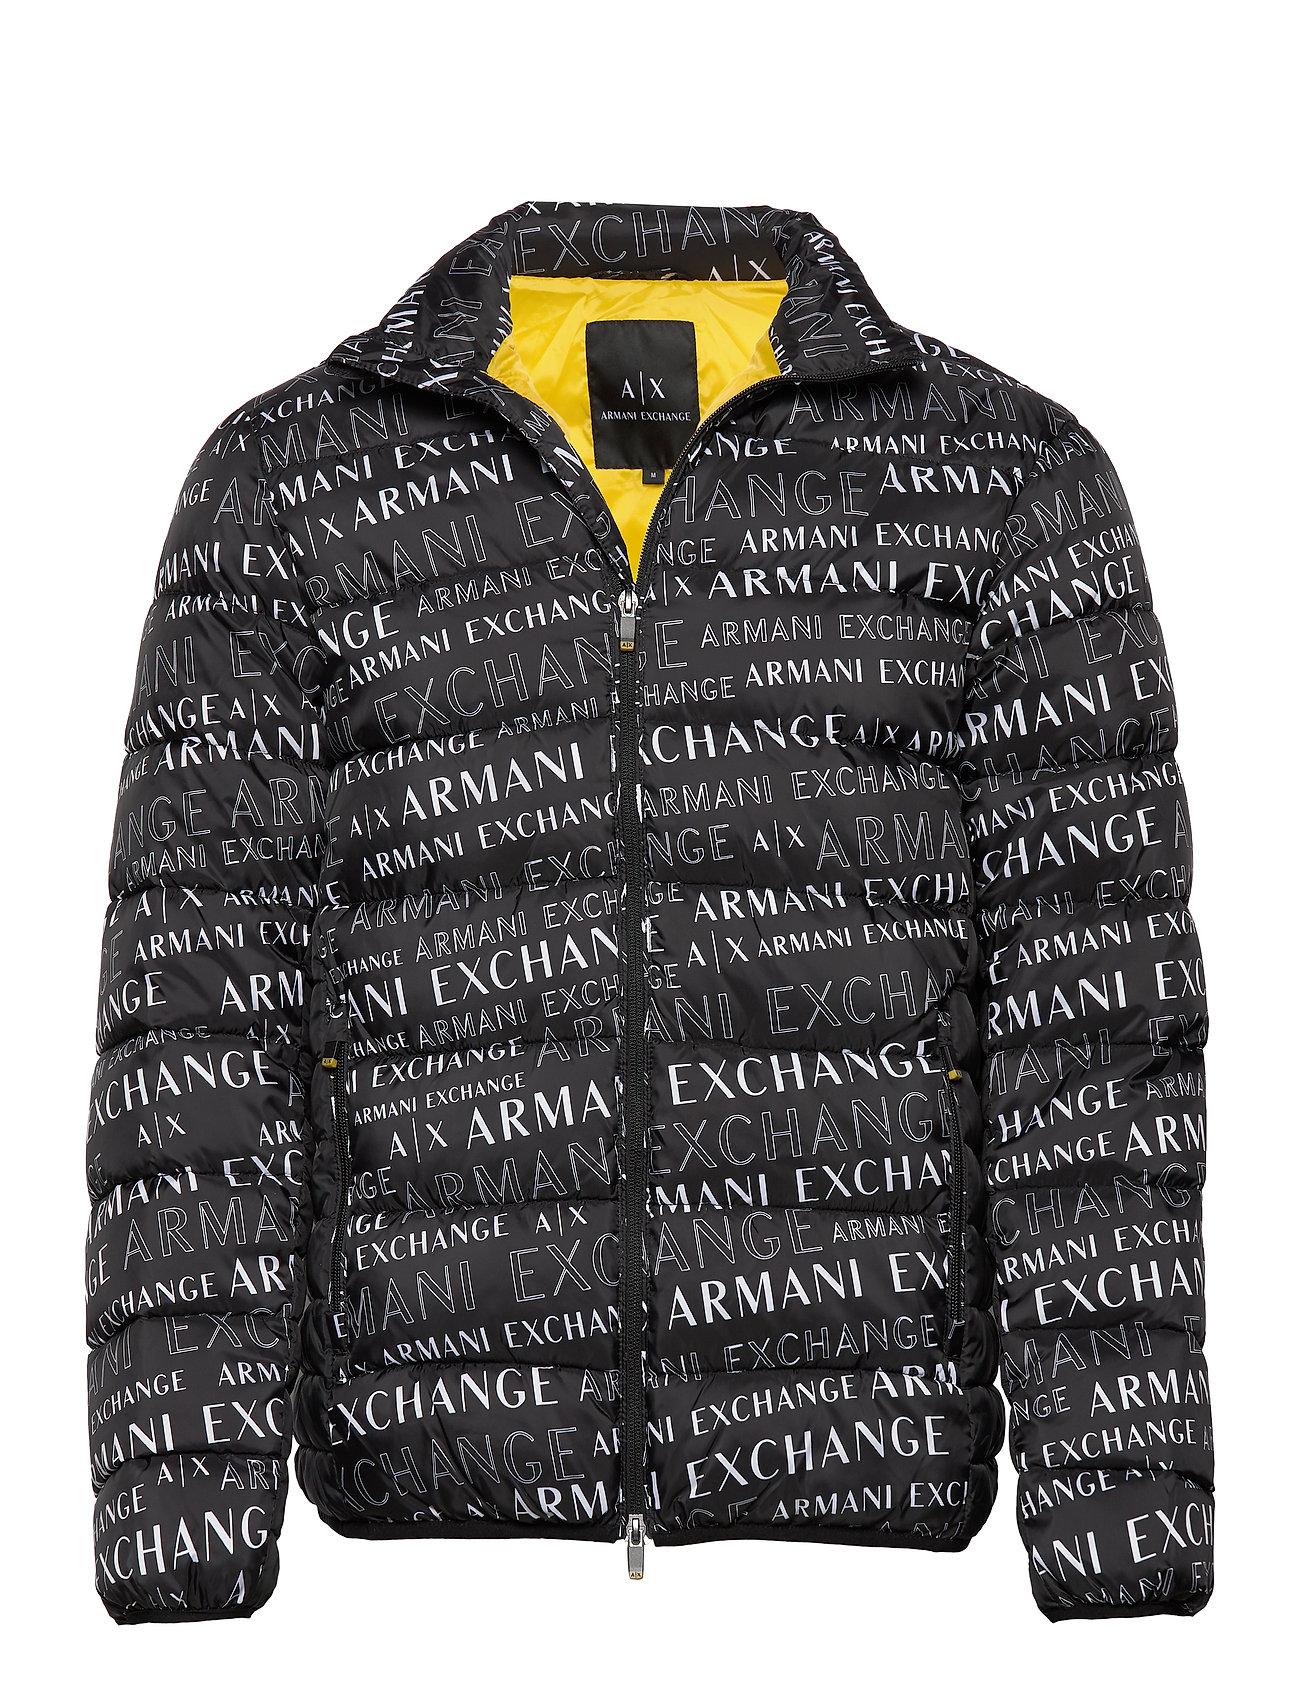 Armani Exchange AX MAN JACKET - A-O EXTREME LOGO BS